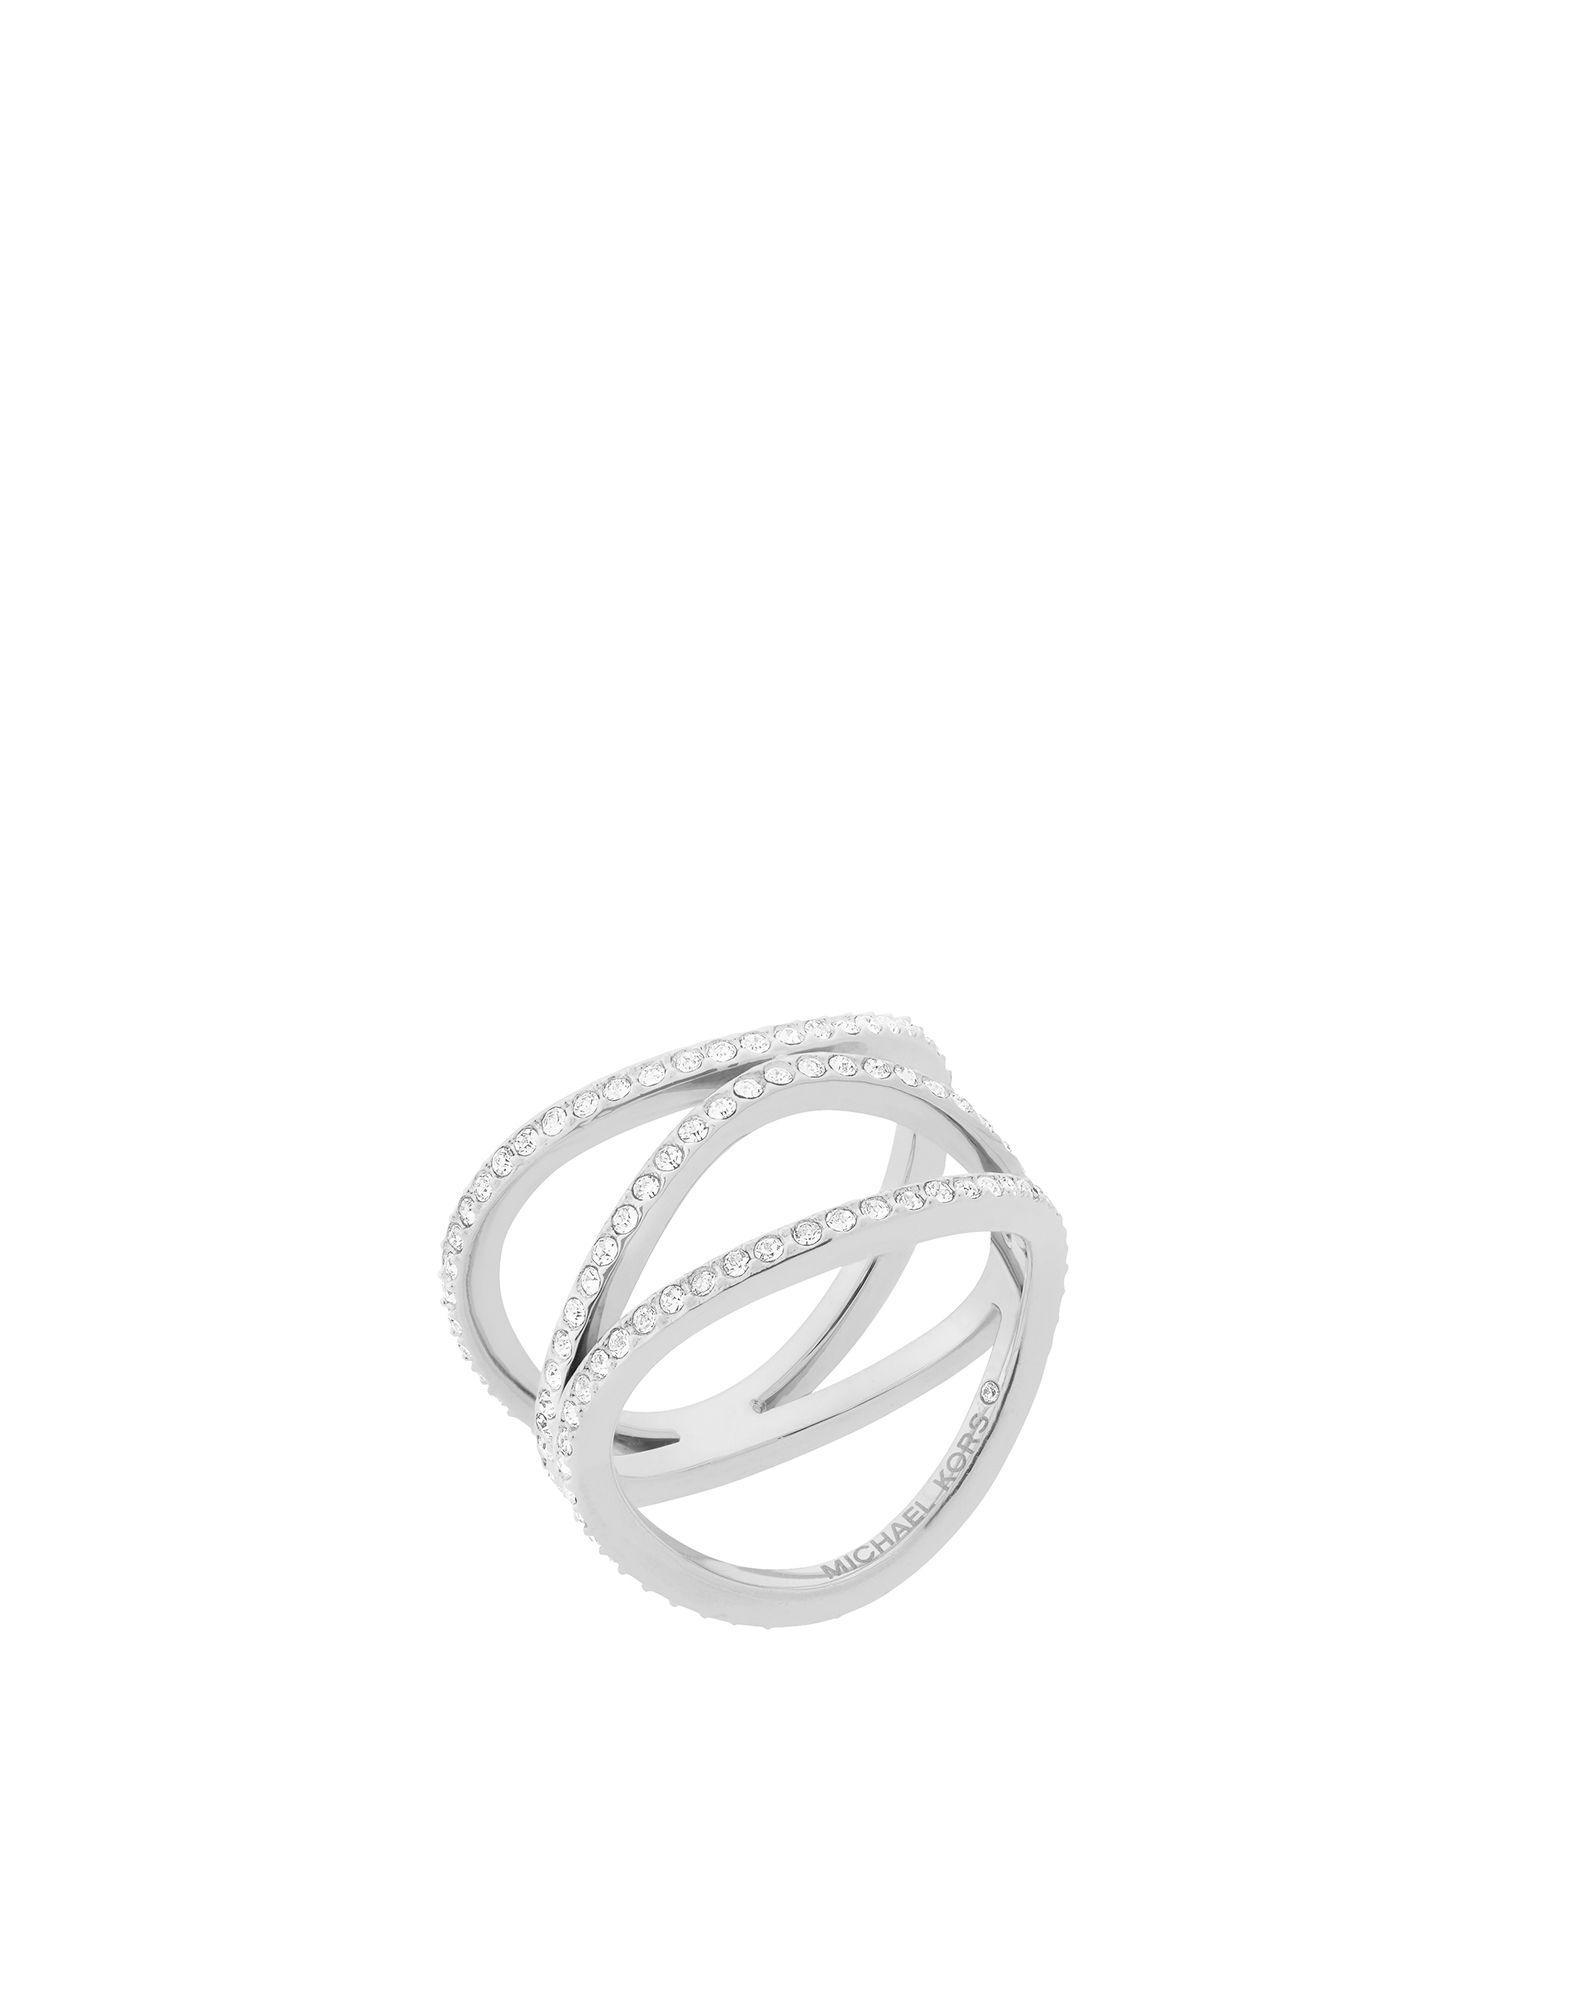 Michael Kors Mkj6639040003 Ladies Ring in Silver (Metallic)